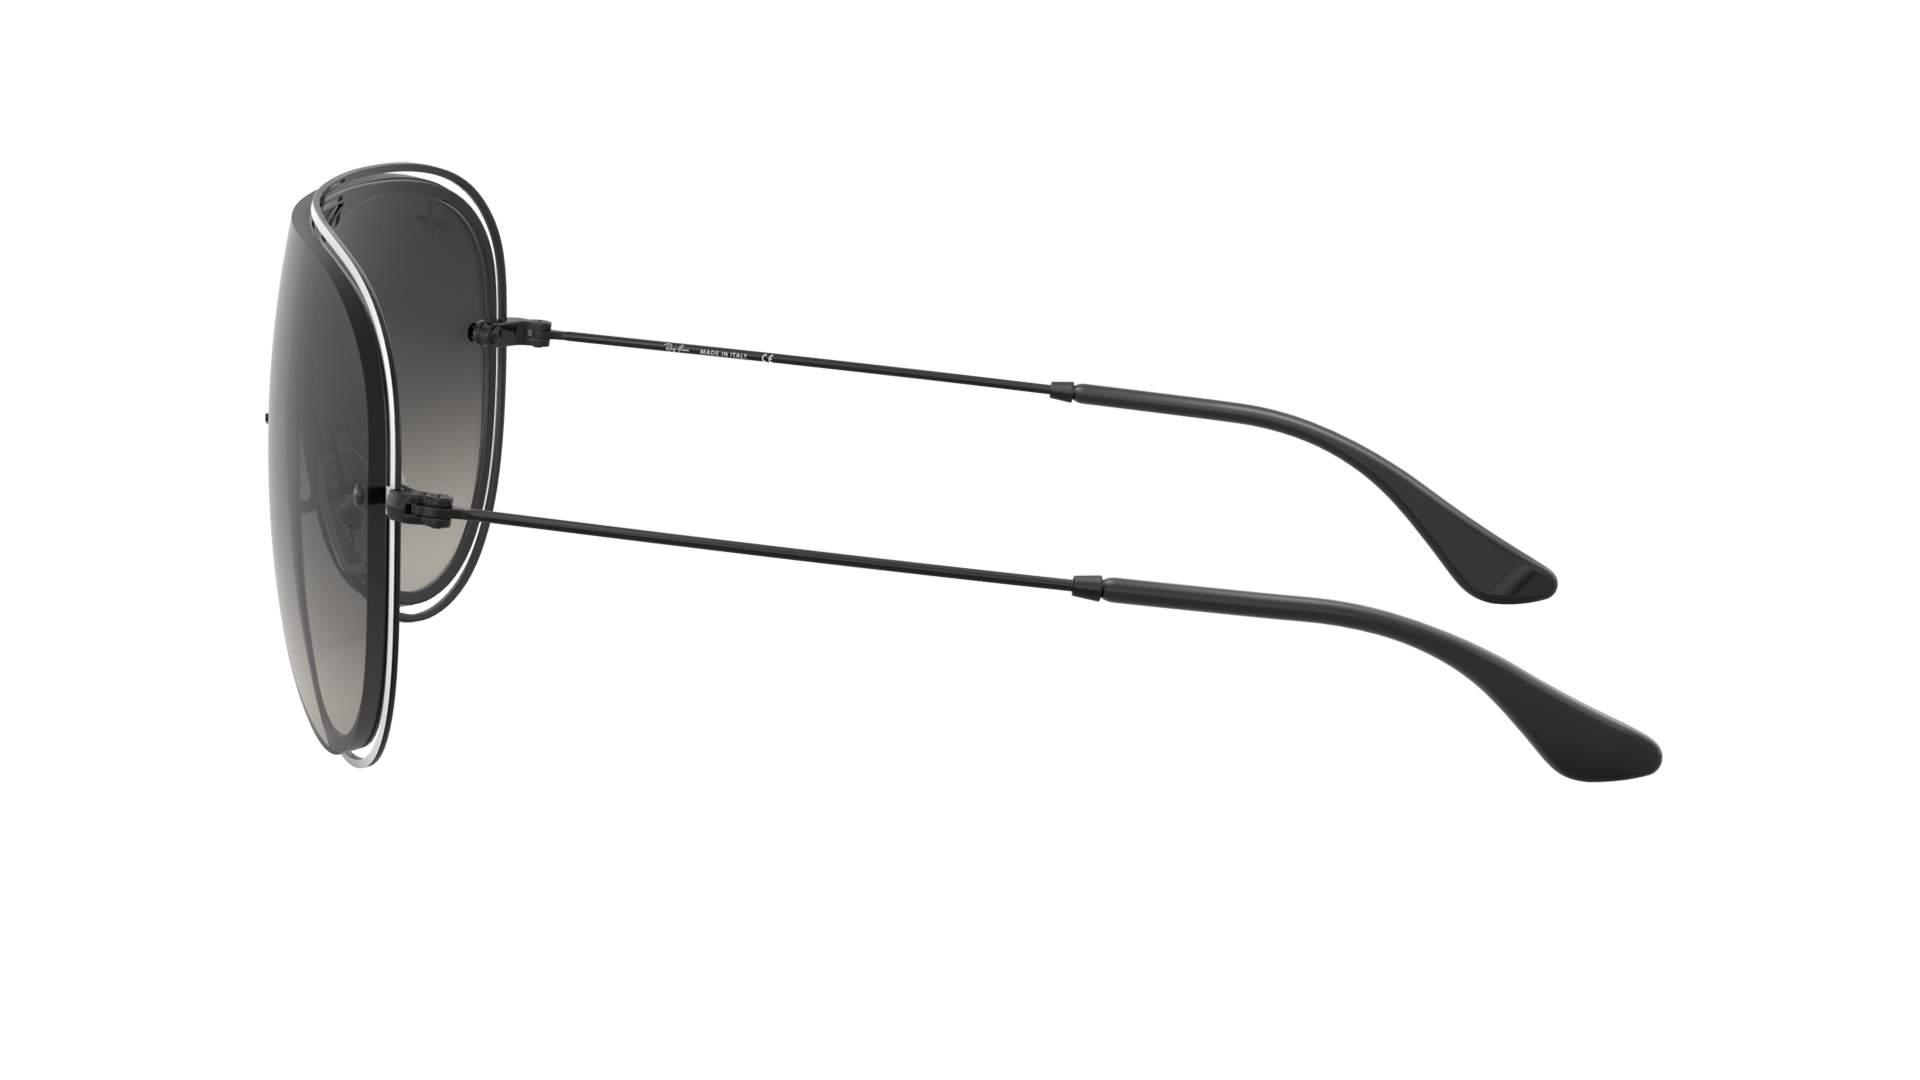 eb065f61be Sunglasses Ray-Ban Shooter Blaze Black RB3605N 9095 11 32-20 Medium Gradient